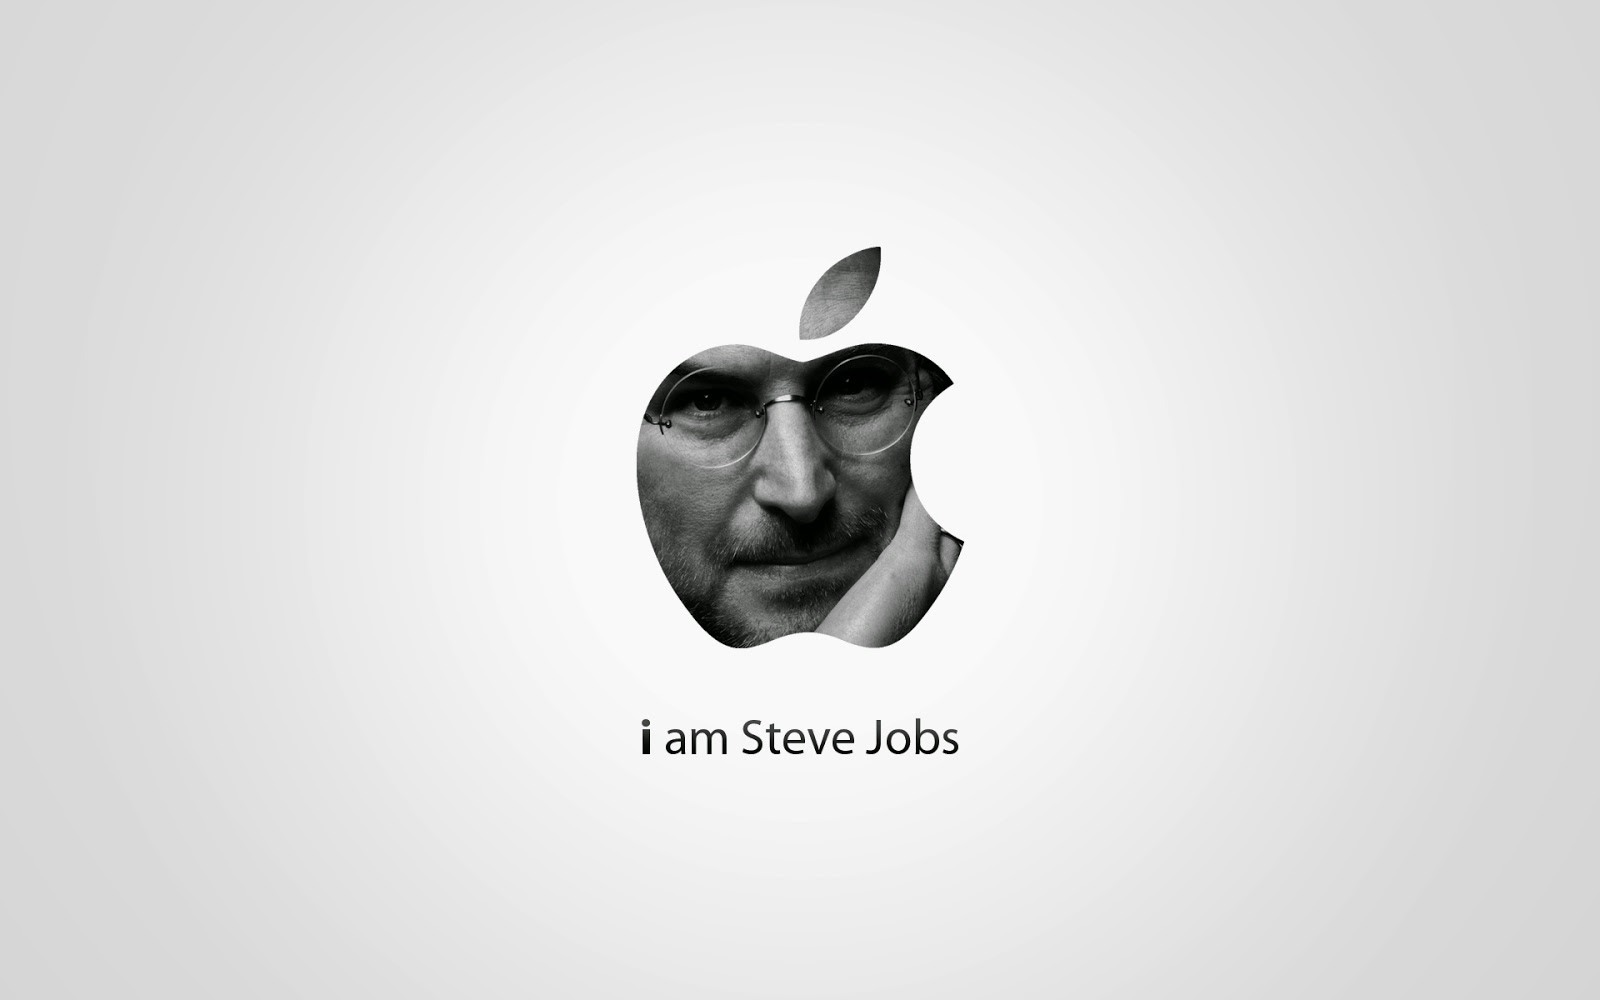 Lições de Steve Jobs